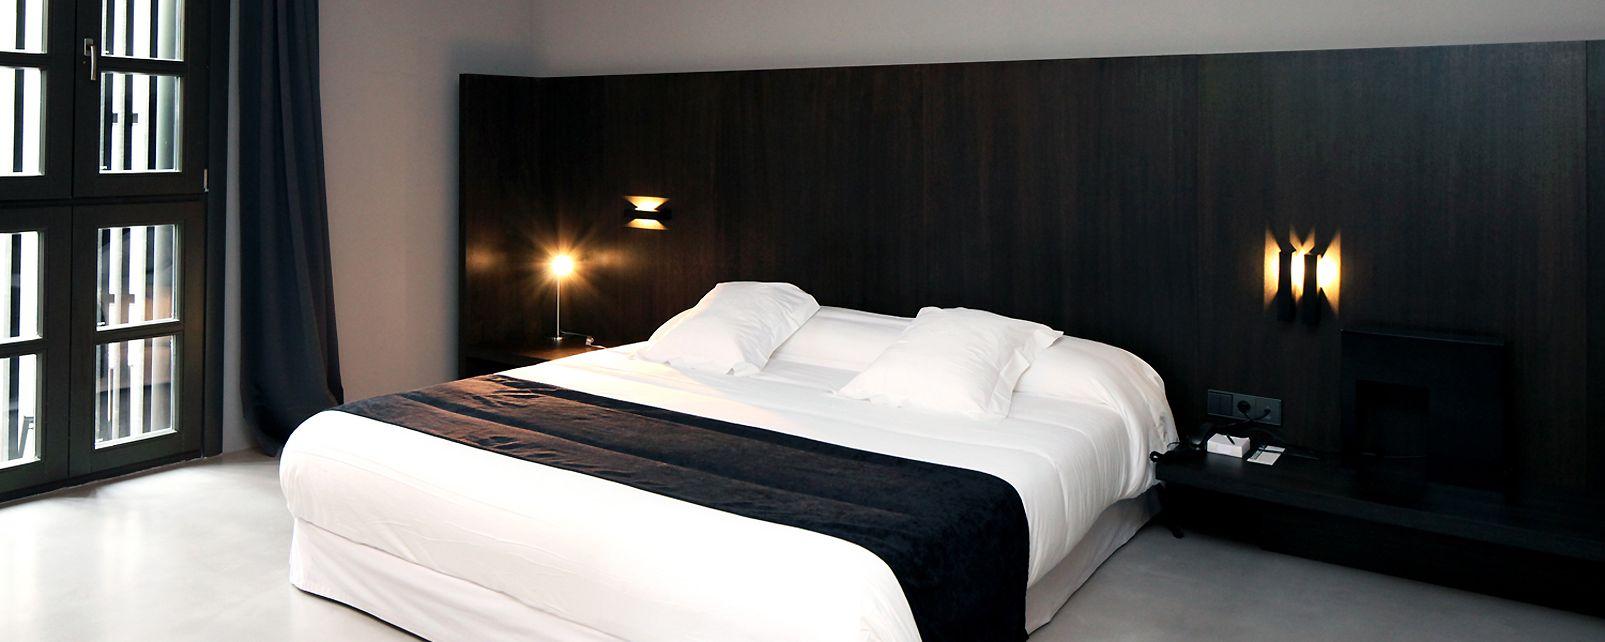 Hotel Caro Hotel